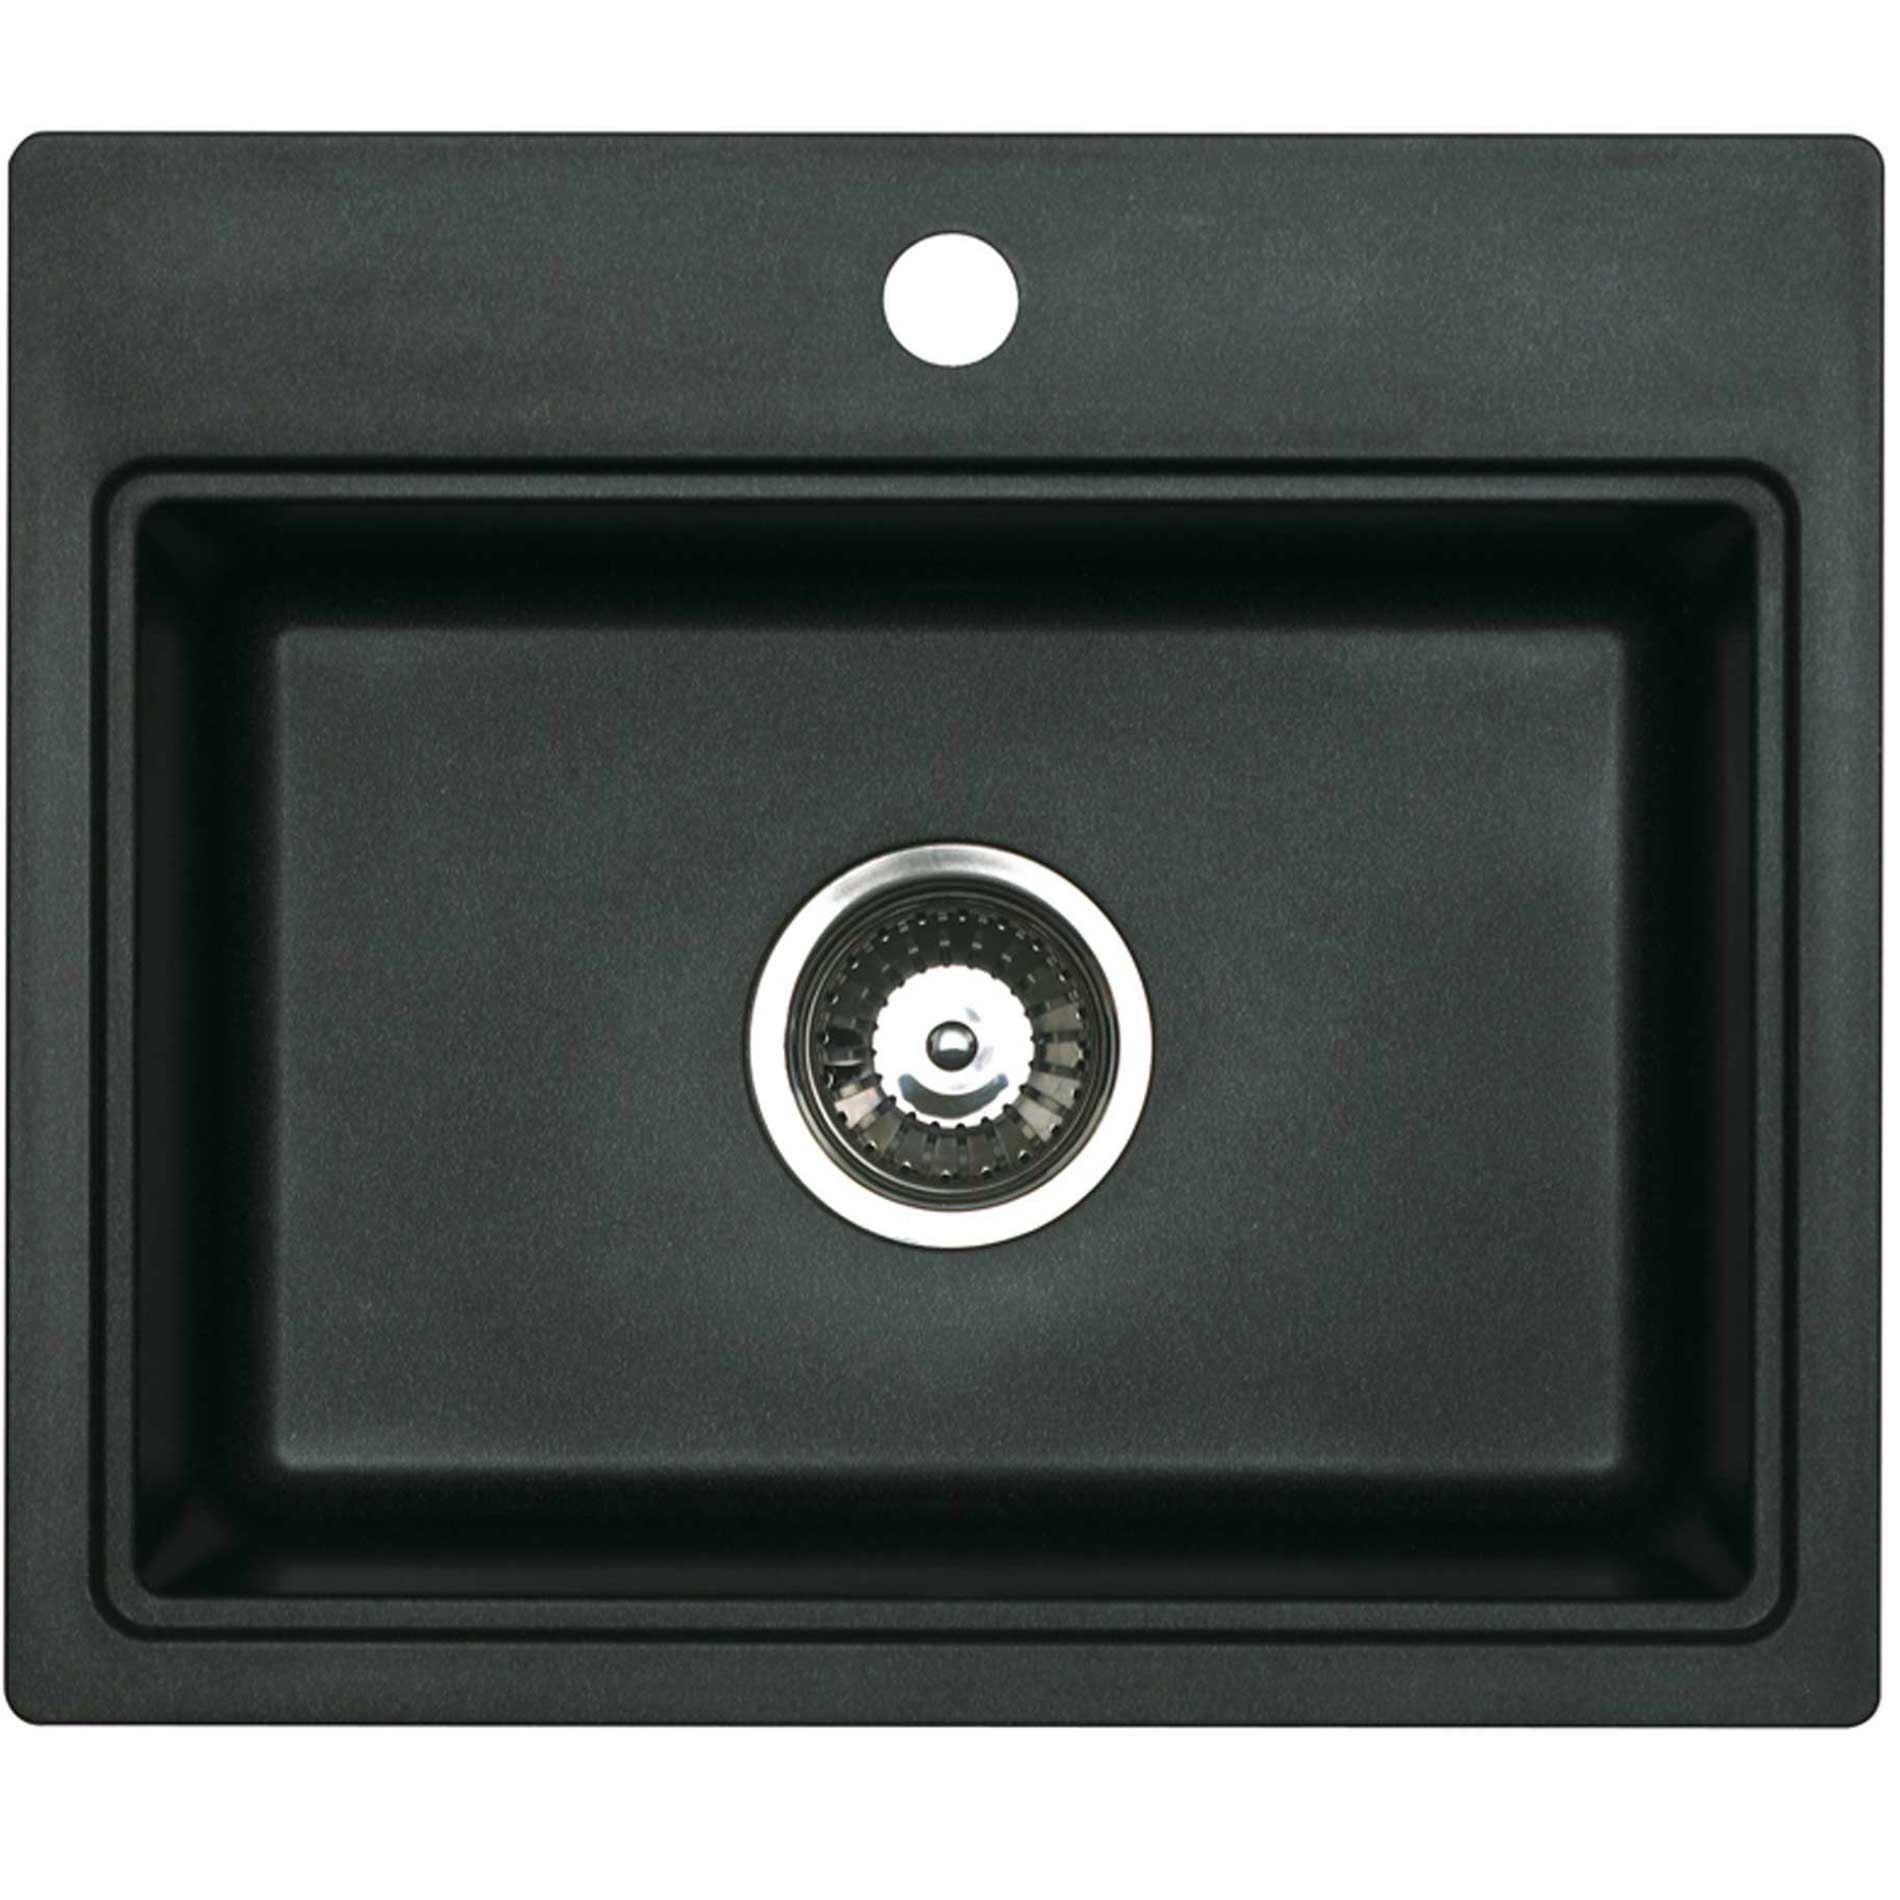 Rok Granite Sinks : ... ROK Metallic Volcano Black Granite Sink - Kitchen Sinks & Taps